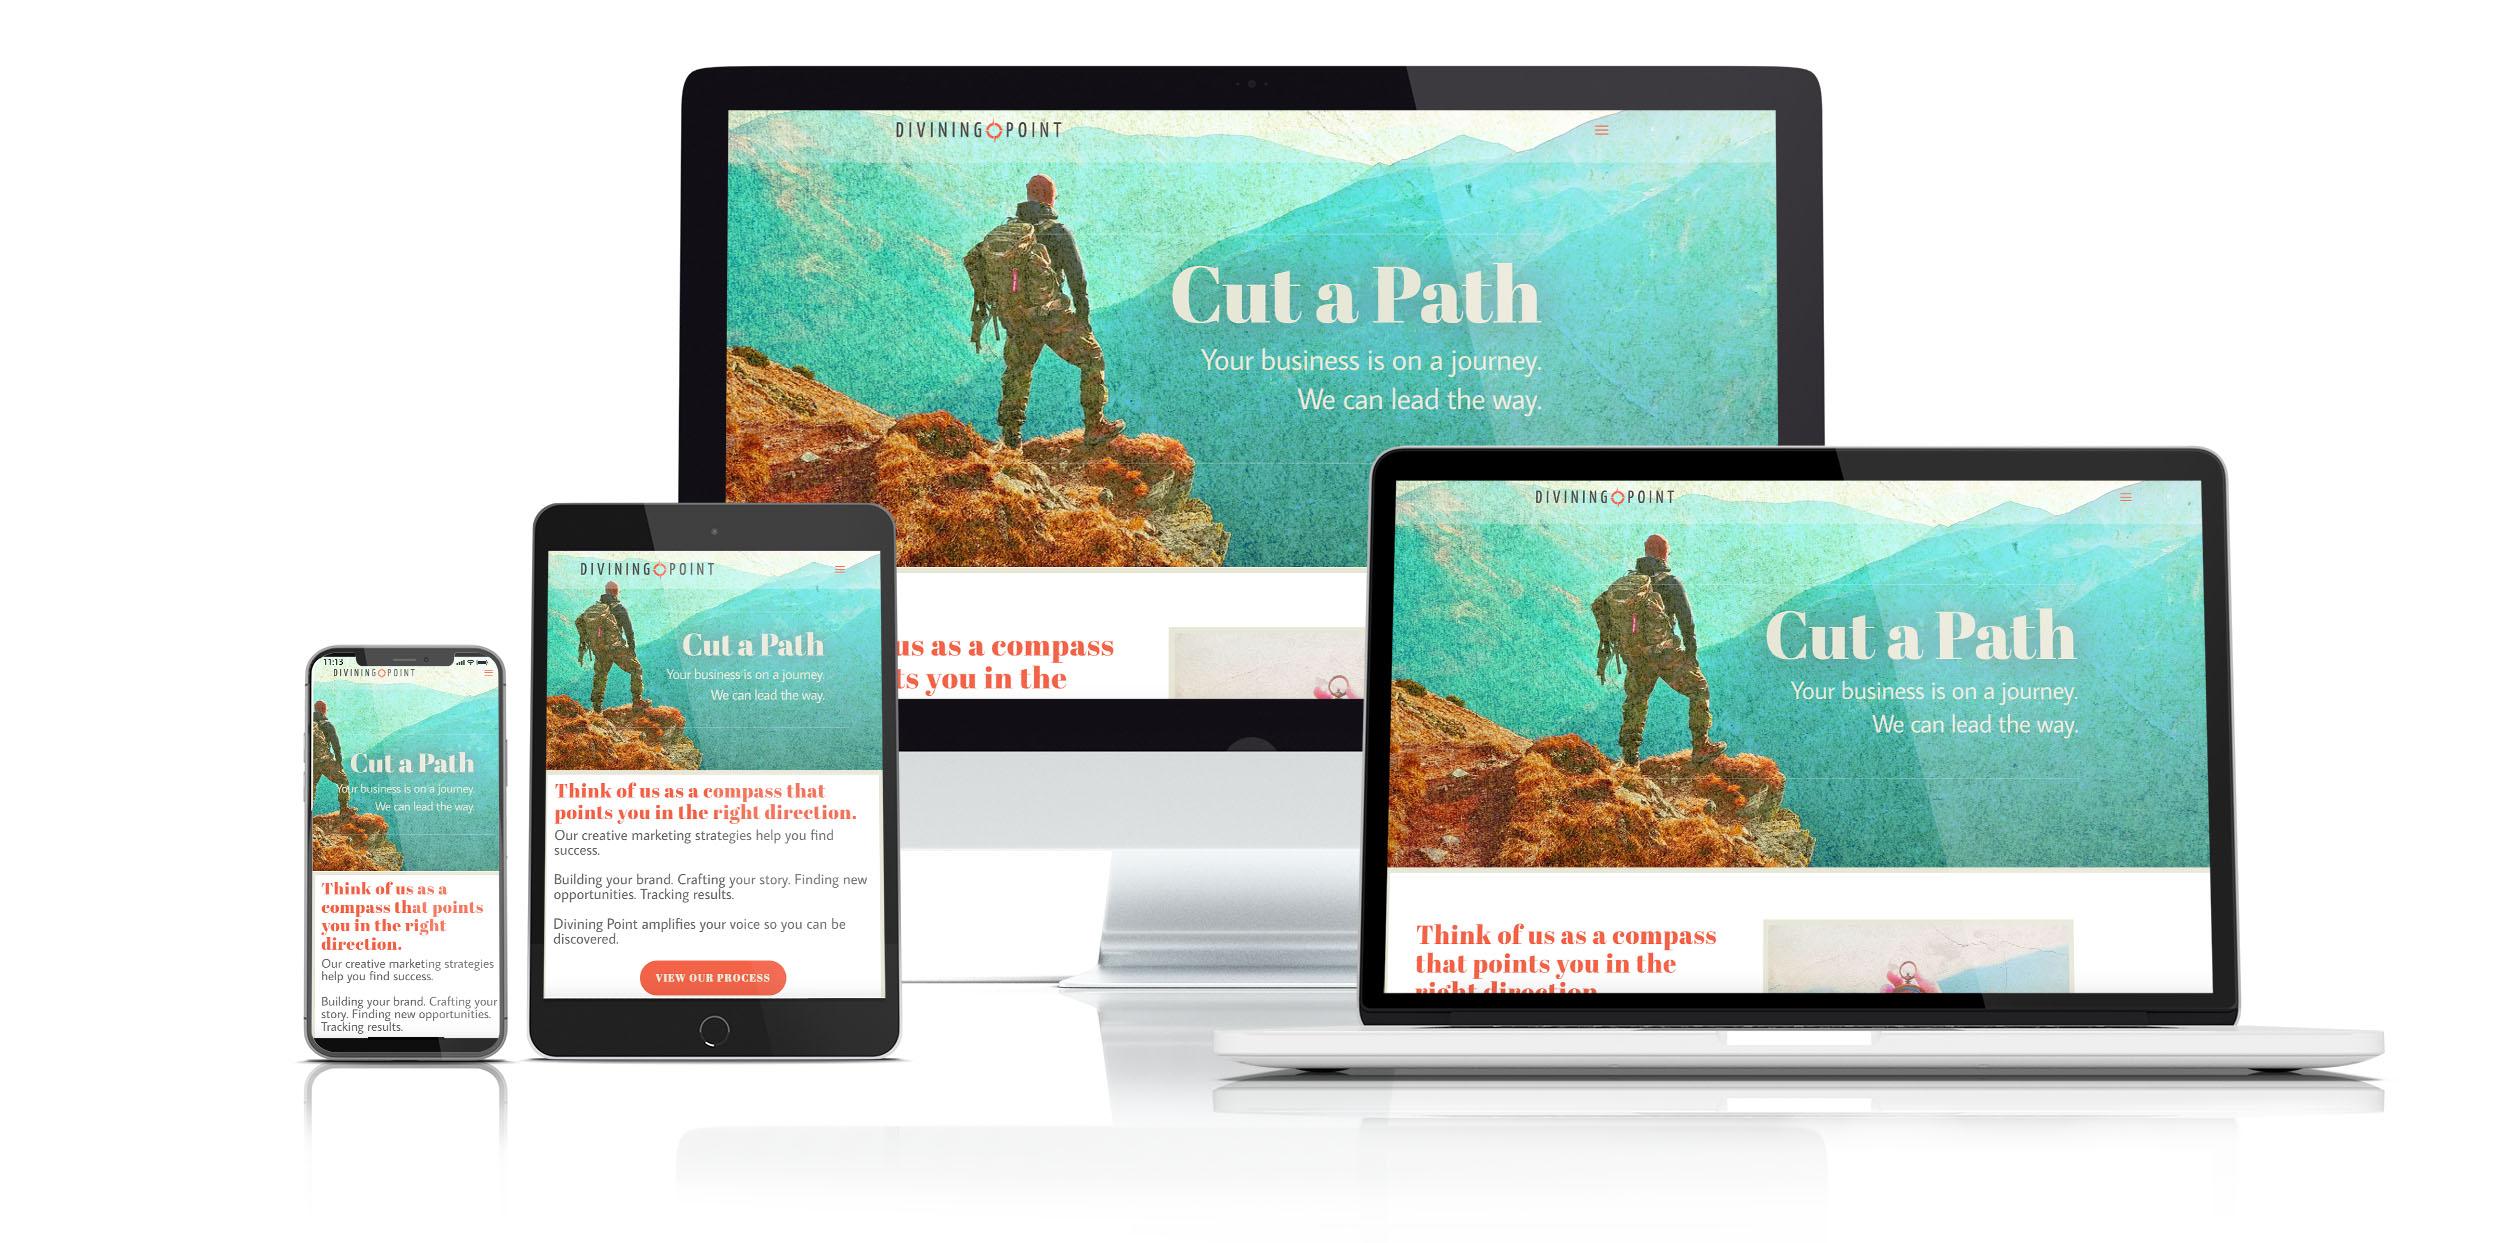 Divining Point LLC website designed by Sharon DeCaro